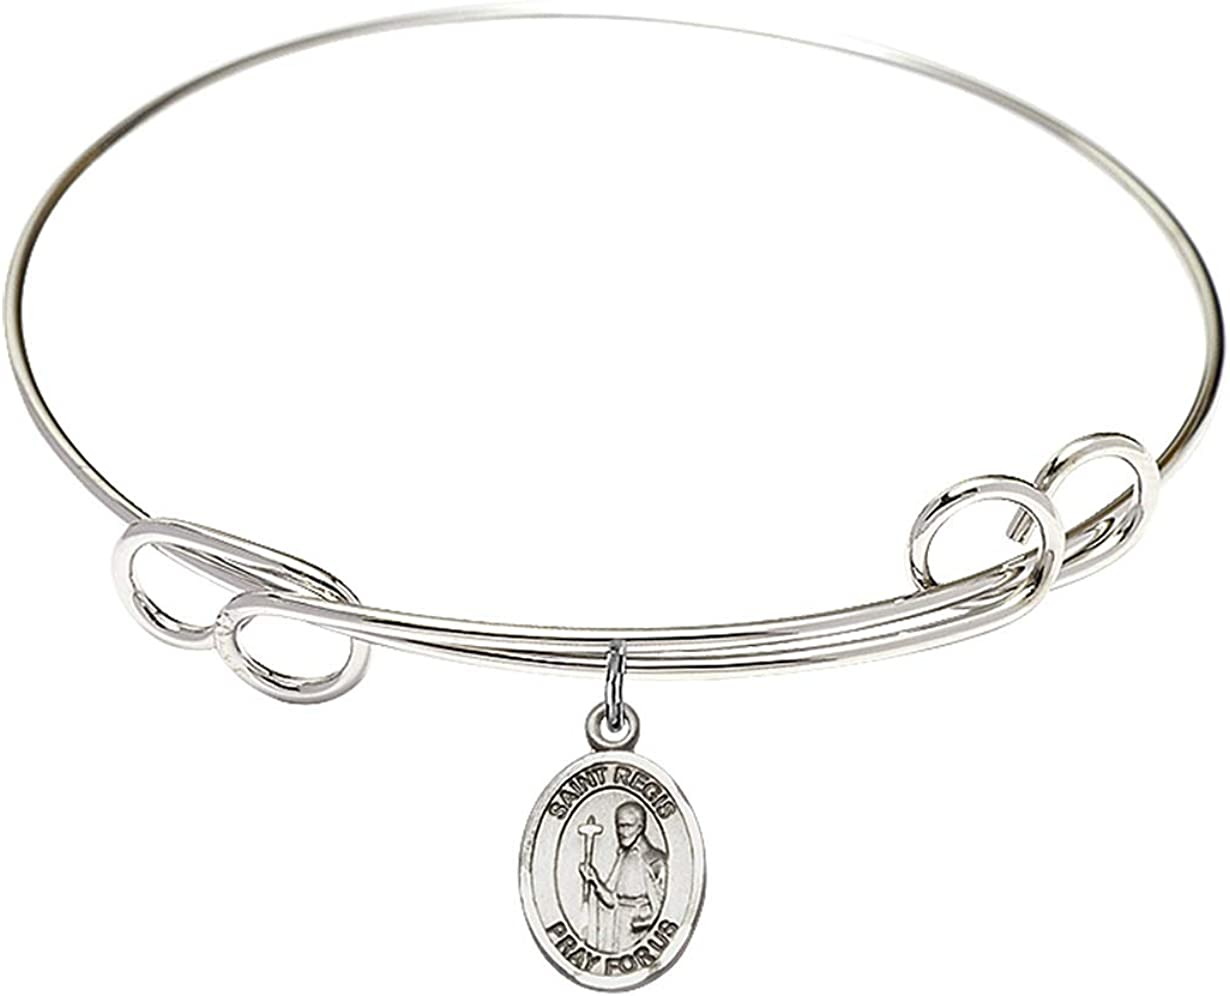 Philomena Charm. DiamondJewelryNY Double Loop Bangle Bracelet with a St